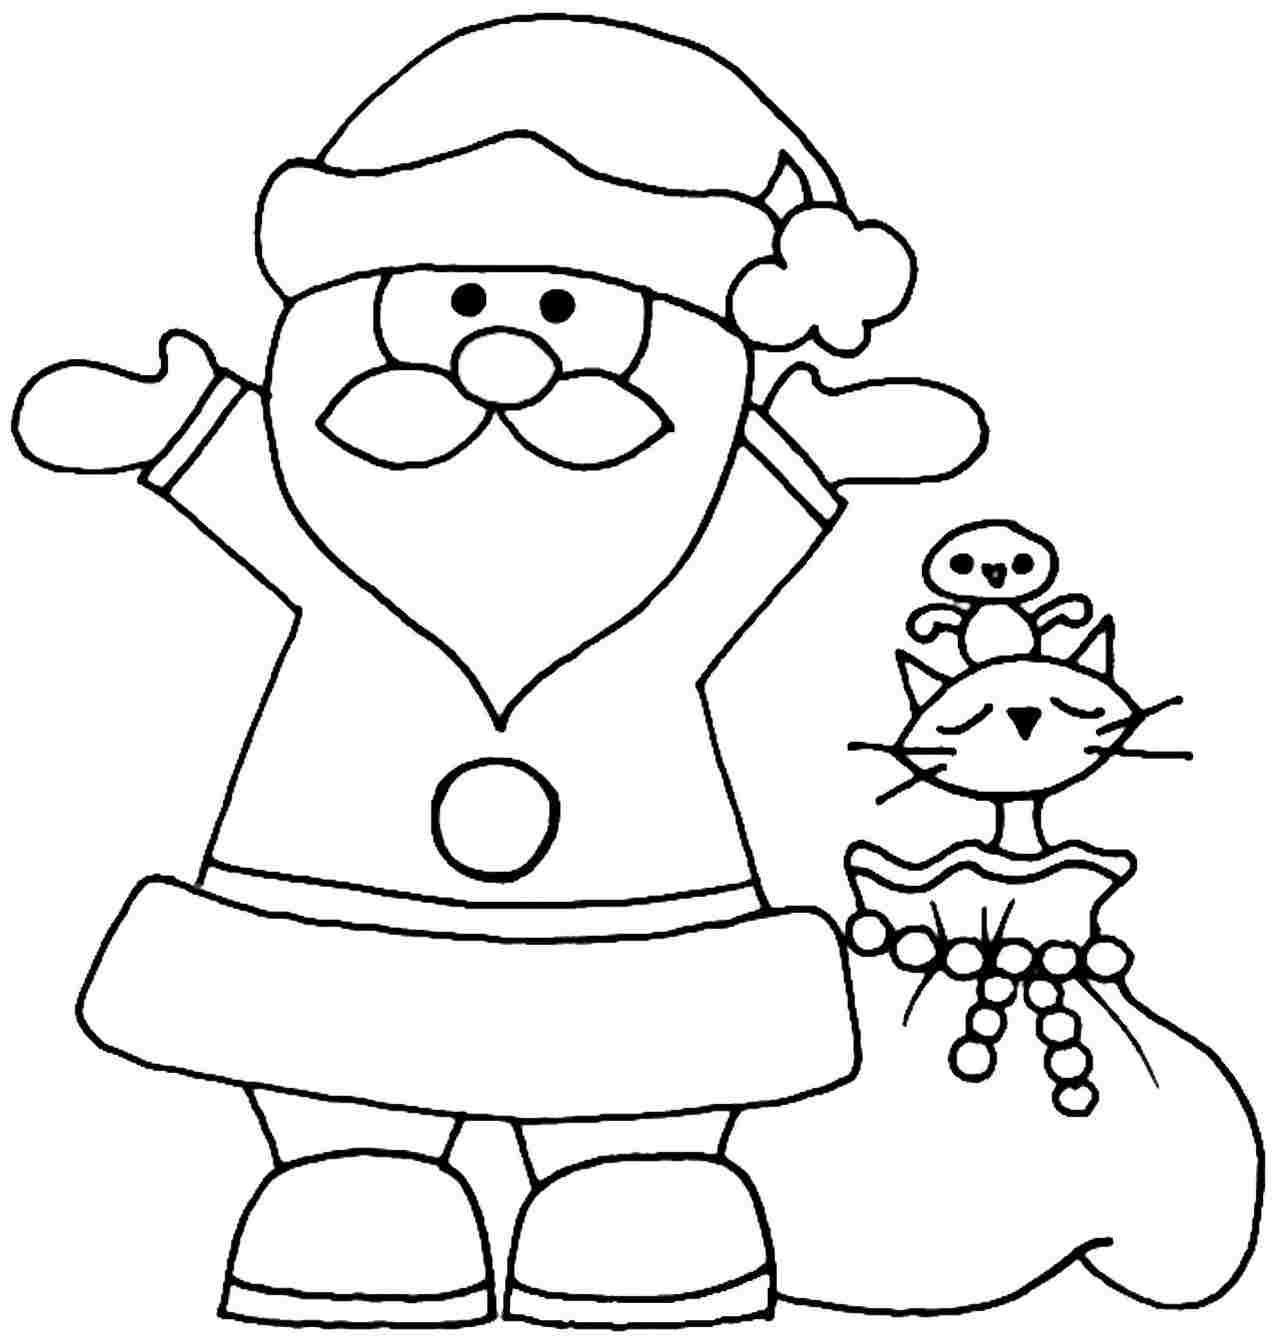 1277x1344 Santa Claus Coloring Pages